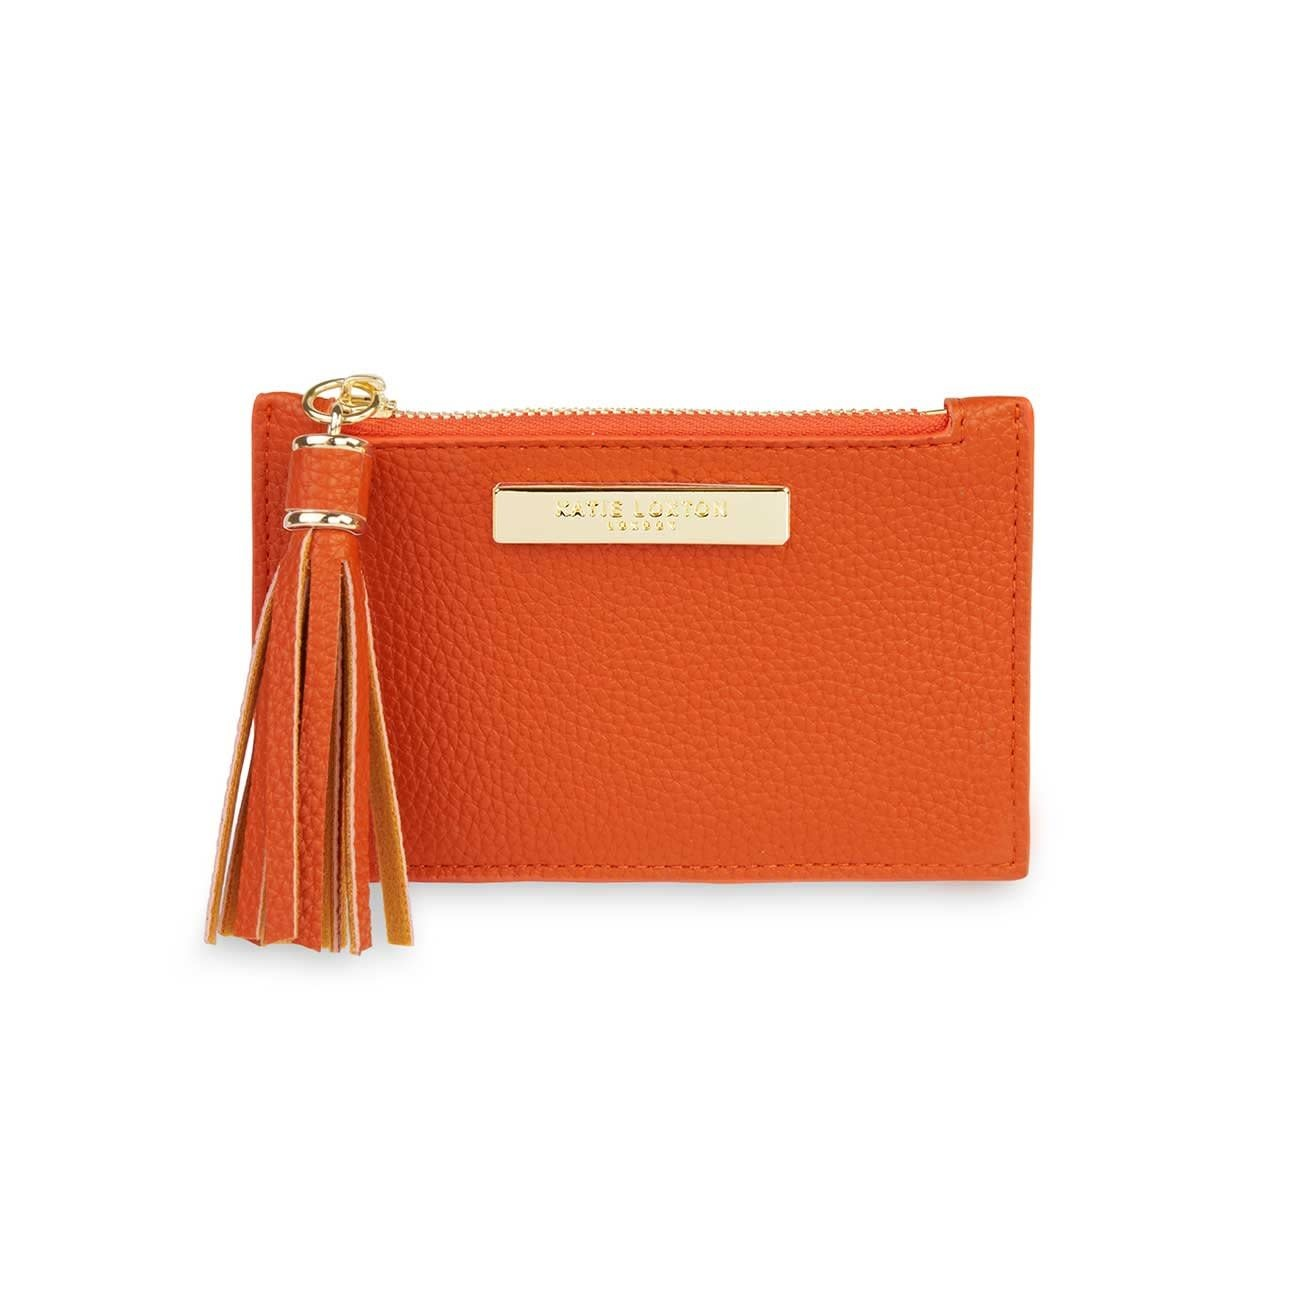 Katie Loxton Sophia tassel card holder burnt orange - 8.5 x 13.5 cm